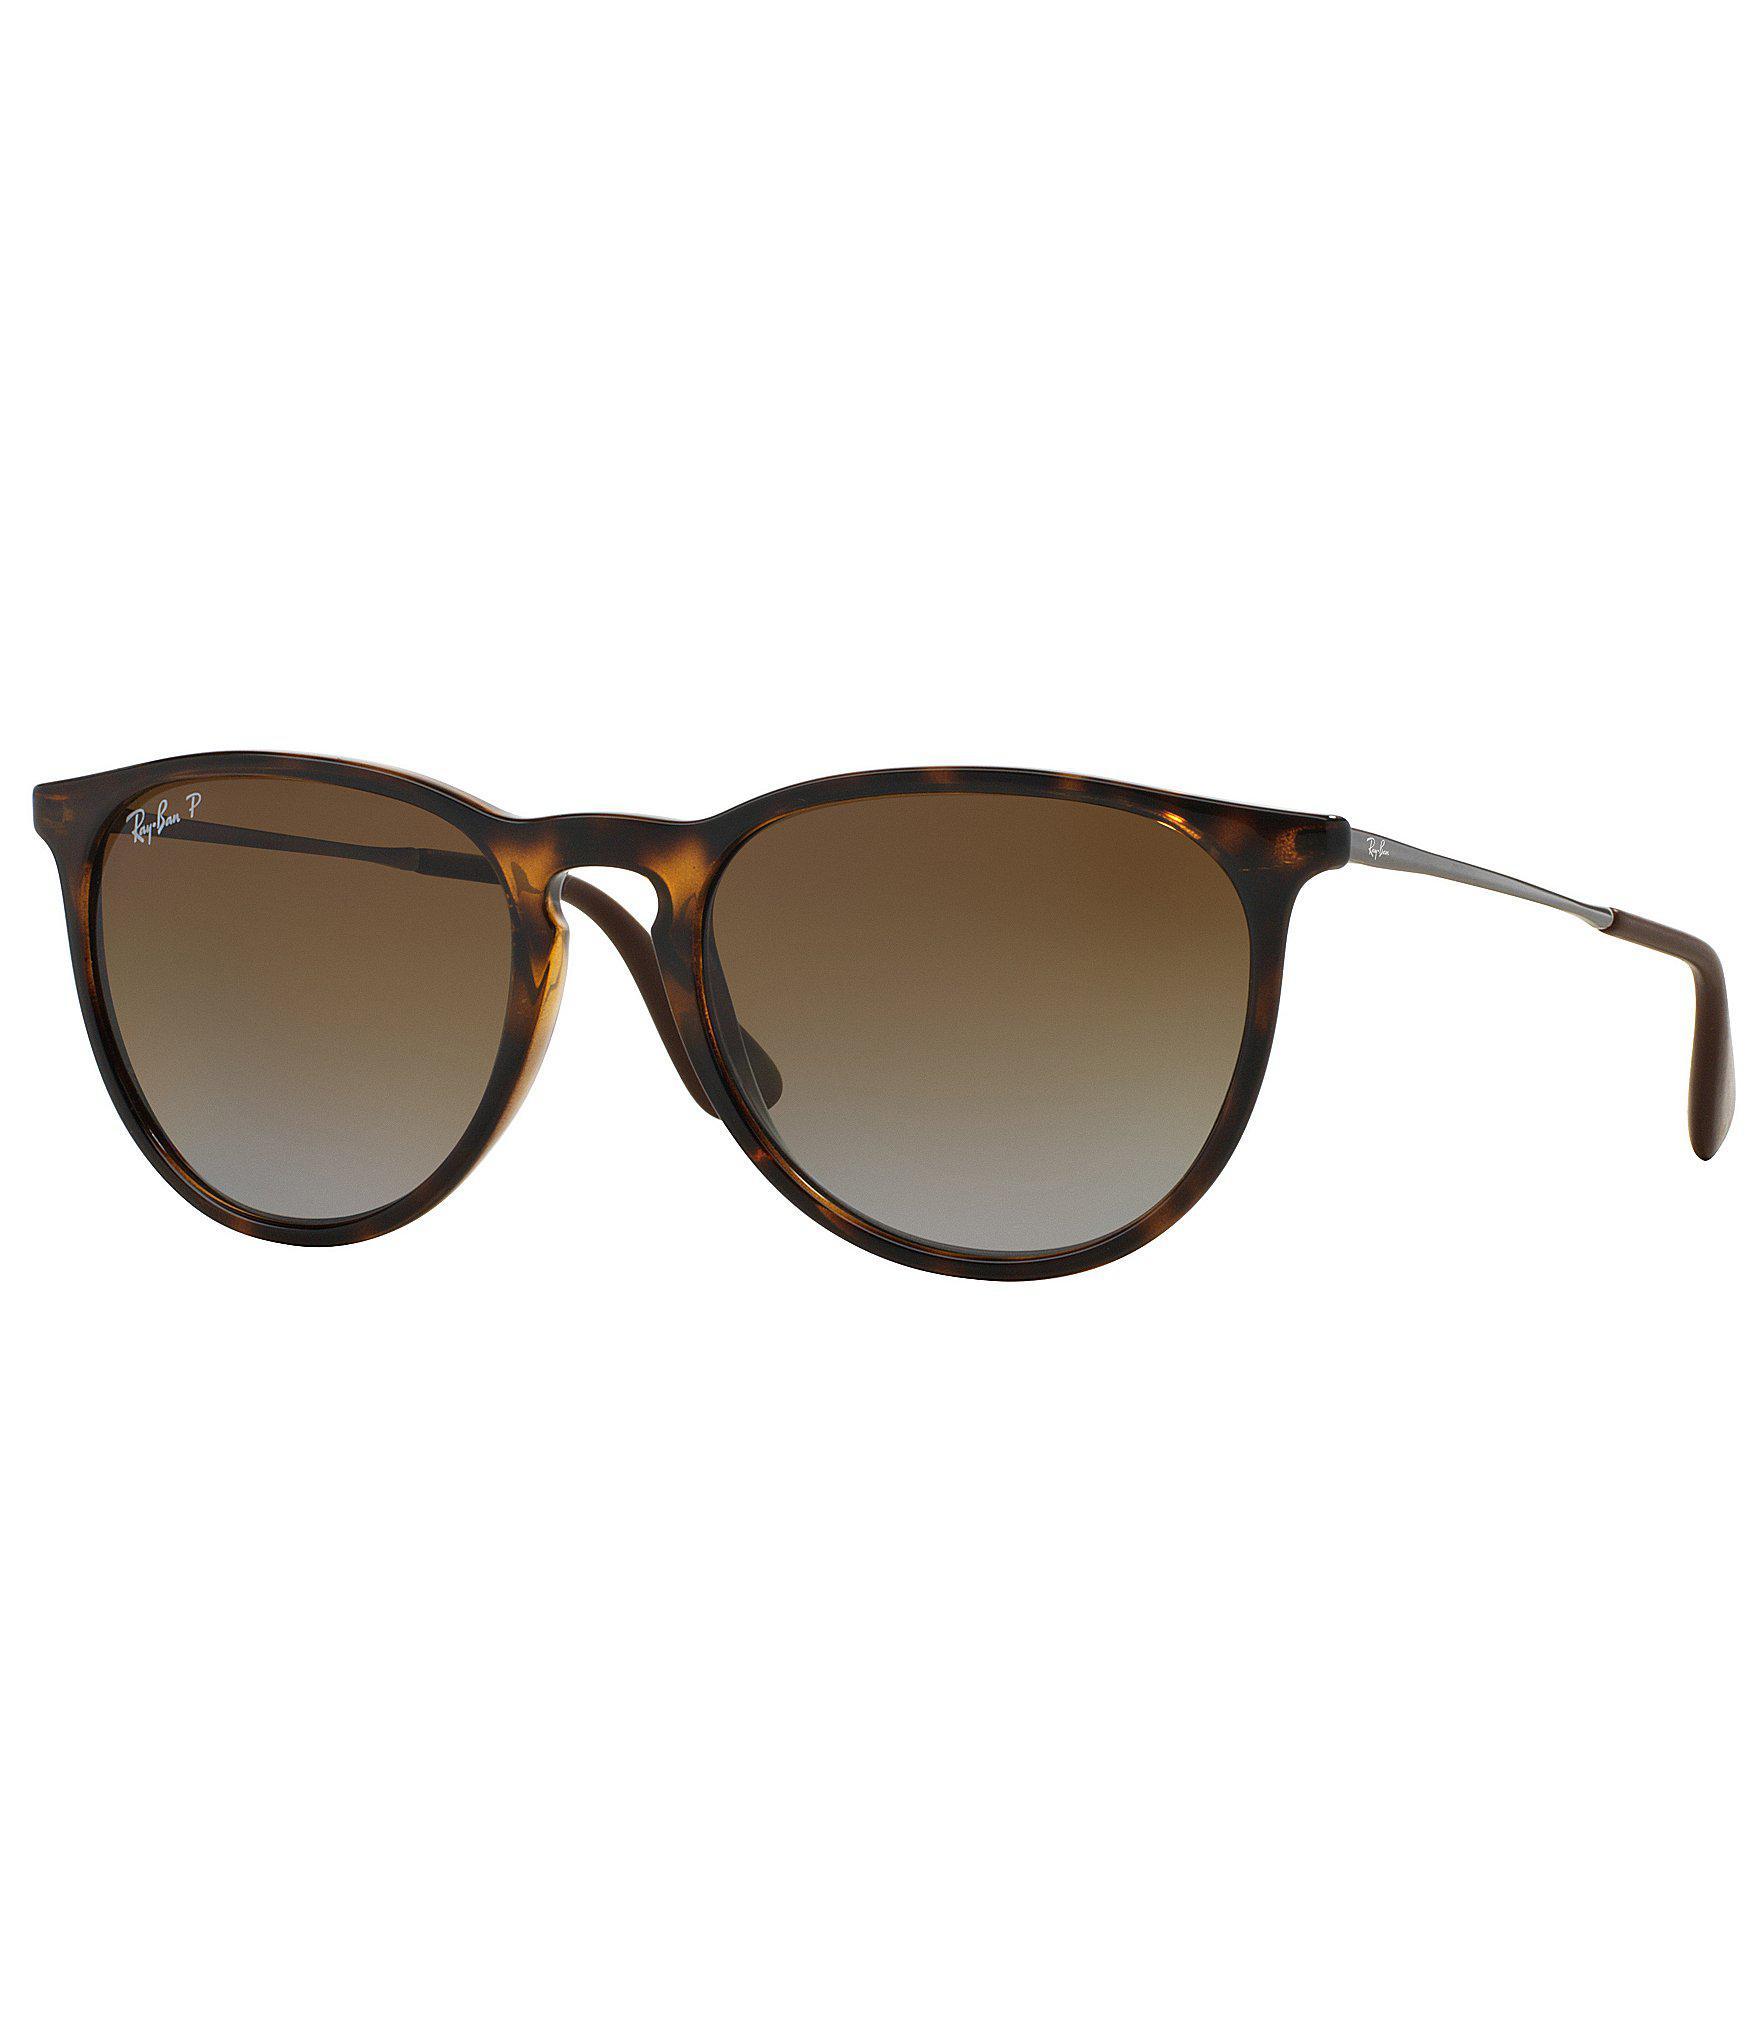 e00dedabcb Lyst - Ray-Ban Erika Polarized Gradient Round Sunglasses in Brown ...